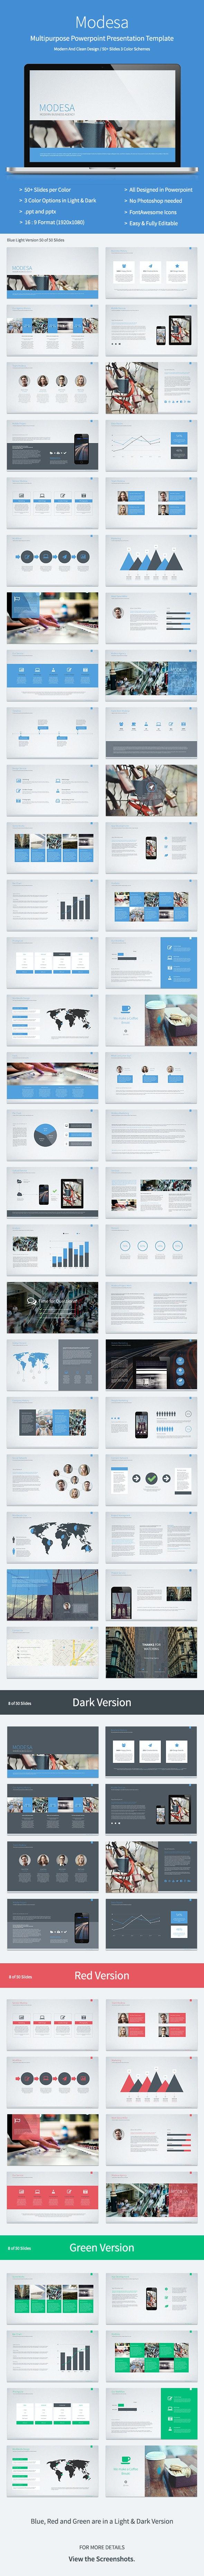 Modesa - Powerpoint Multipurpose Template - PowerPoint Templates Presentation Templates